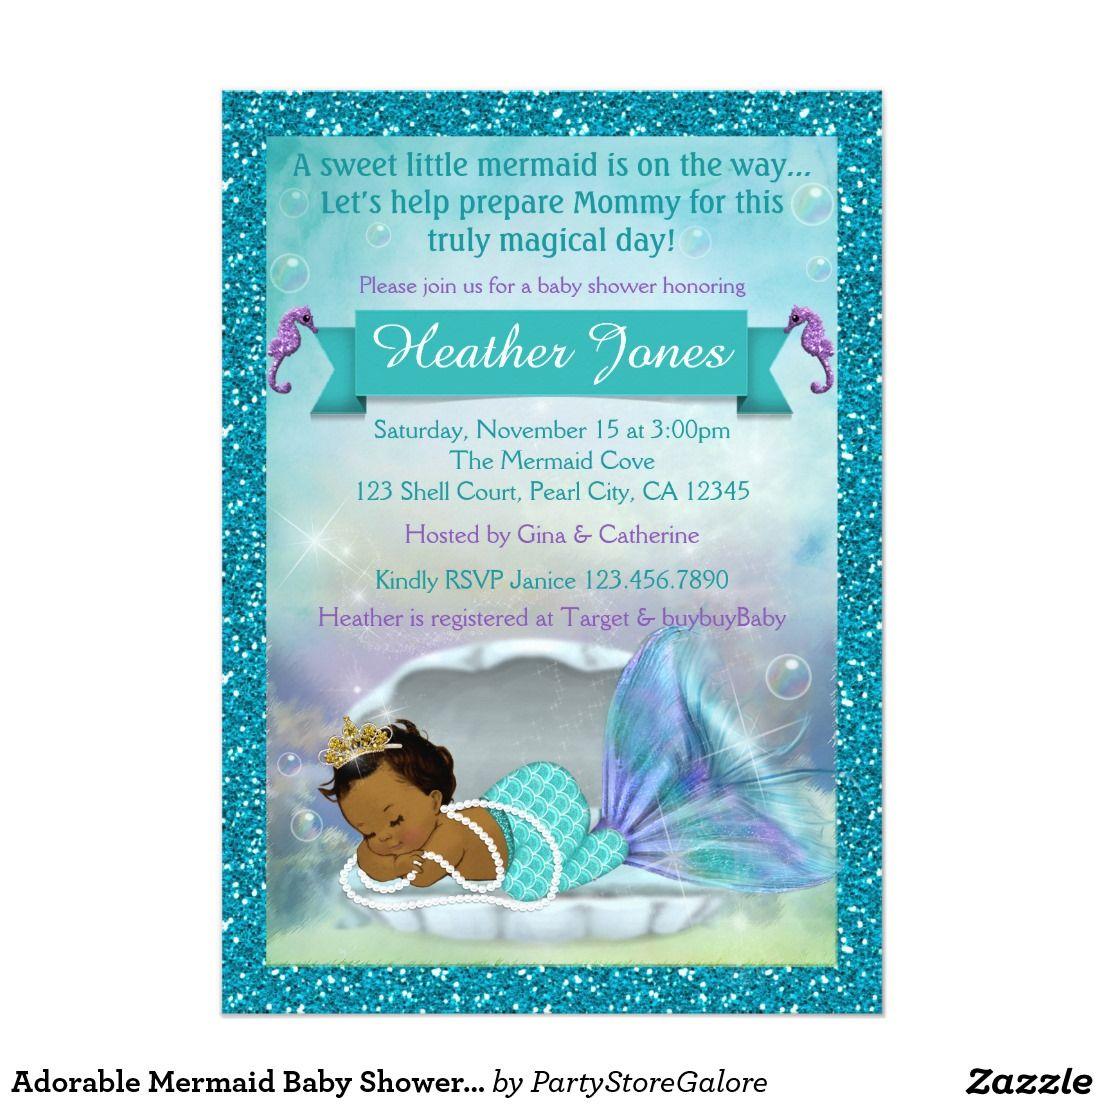 Adorable Mermaid Baby Shower Invitations #135 DARK | baby shower ...